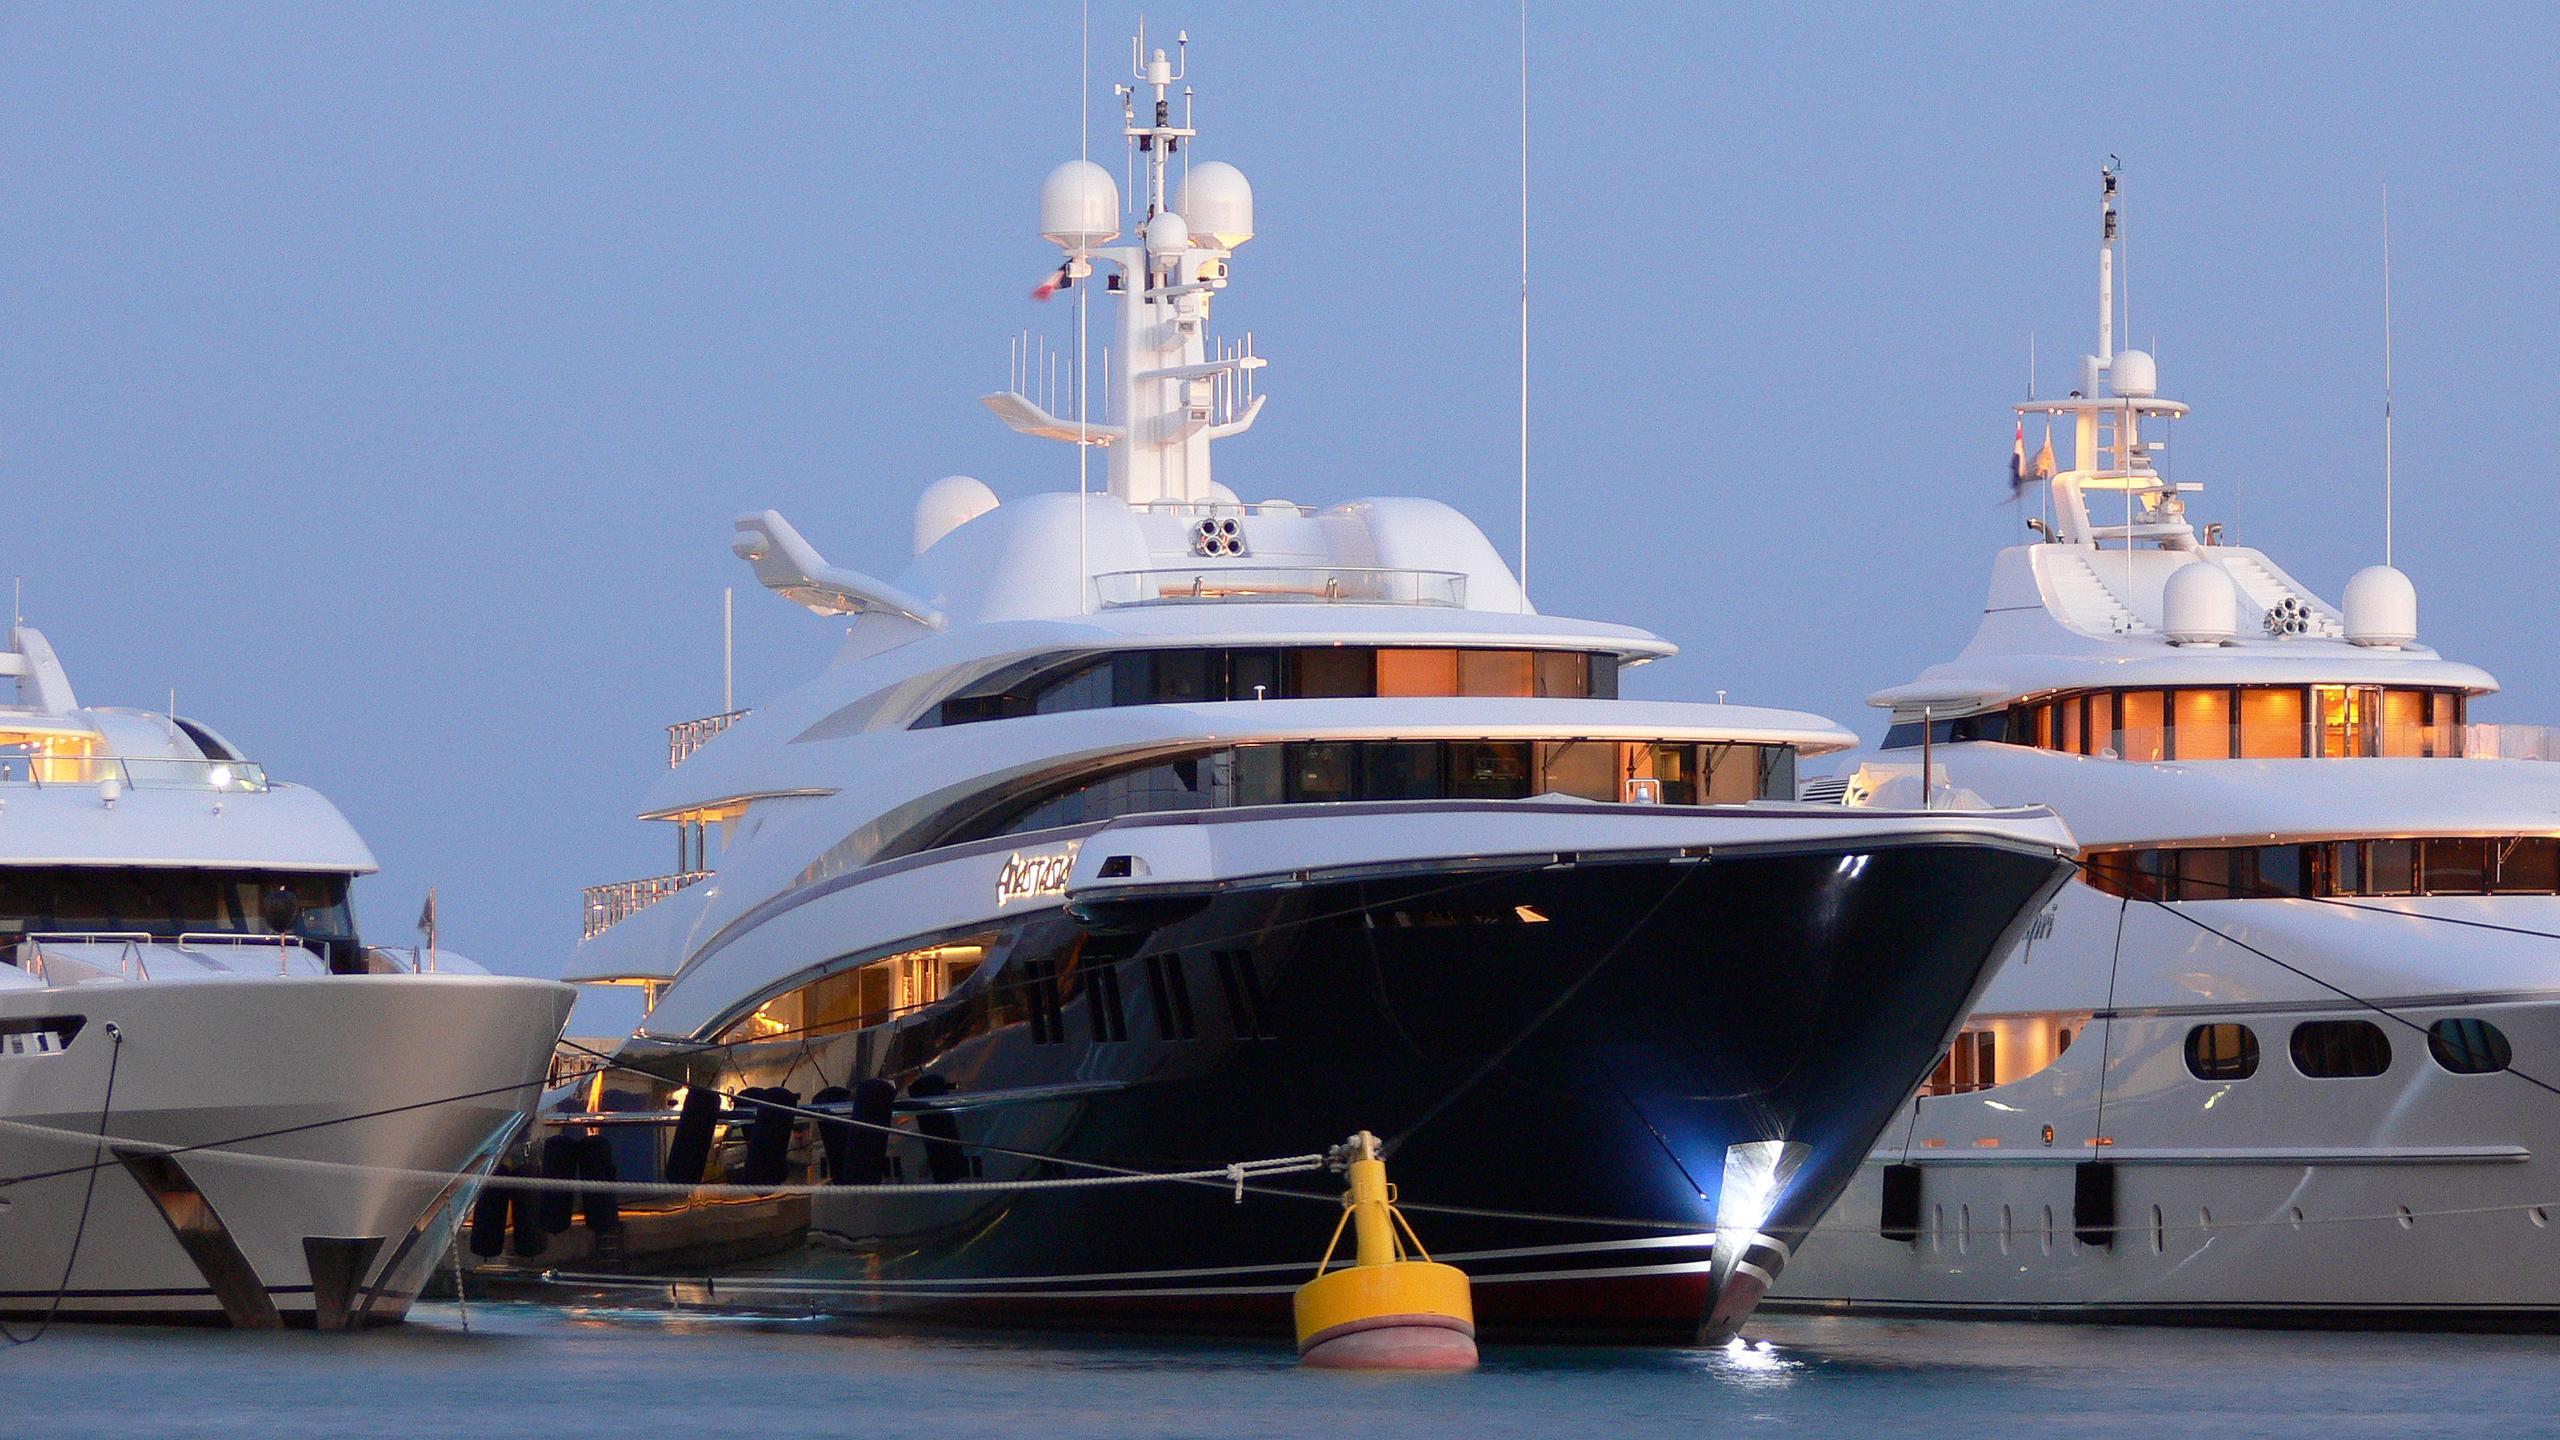 anastasia-motor-yacht-oceanco-2008-75m-bow-by-night